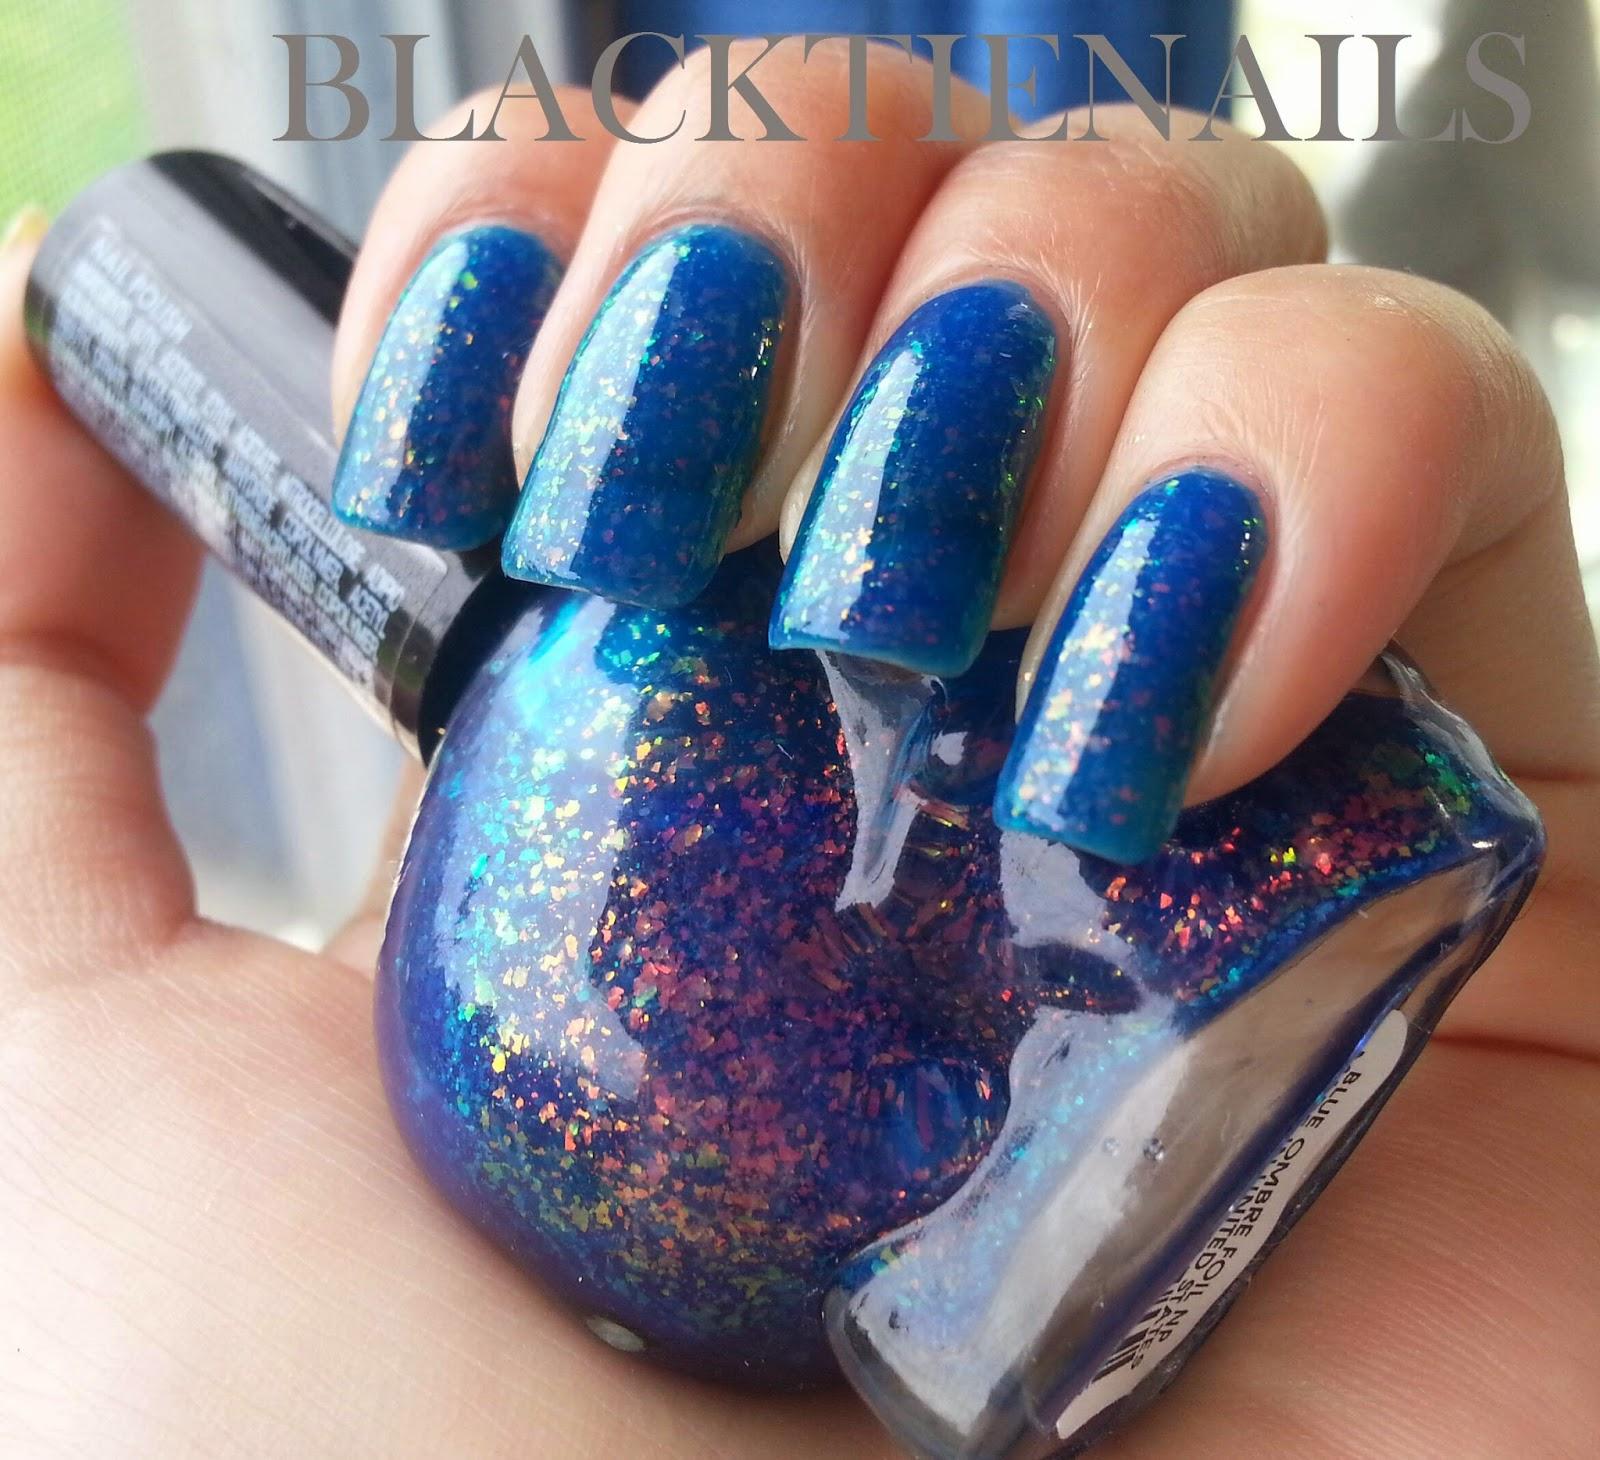 Black Tie Nails: Blackheart Beauty Blue Ombre Foil Nail Polish ...